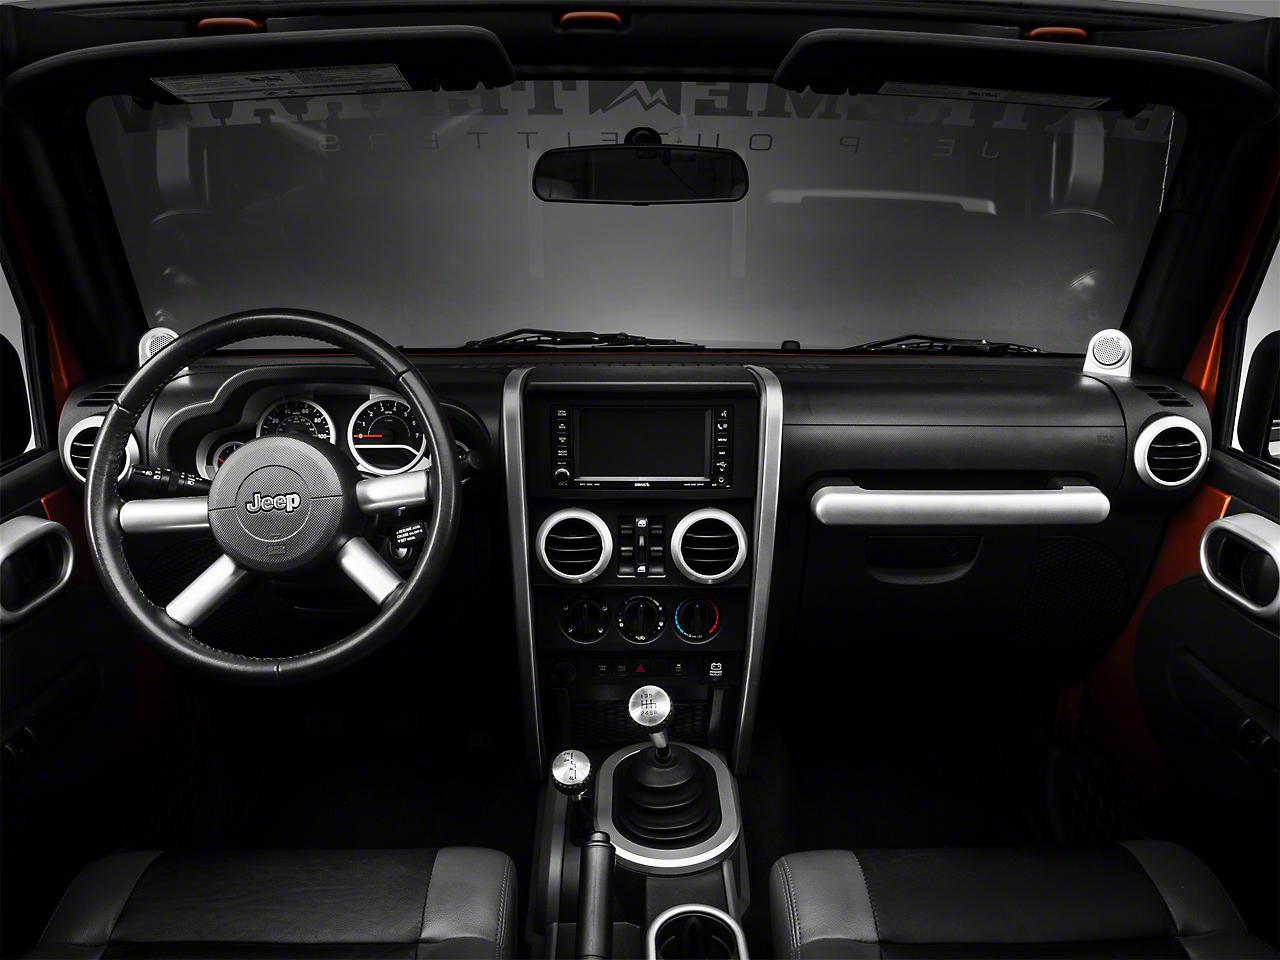 Rugged Ridge Brushed Silver Interior Trim Accent Kit (07-10 Jeep Wrangler JK 4 Door w/ Manual Transmission, Manual Windows)